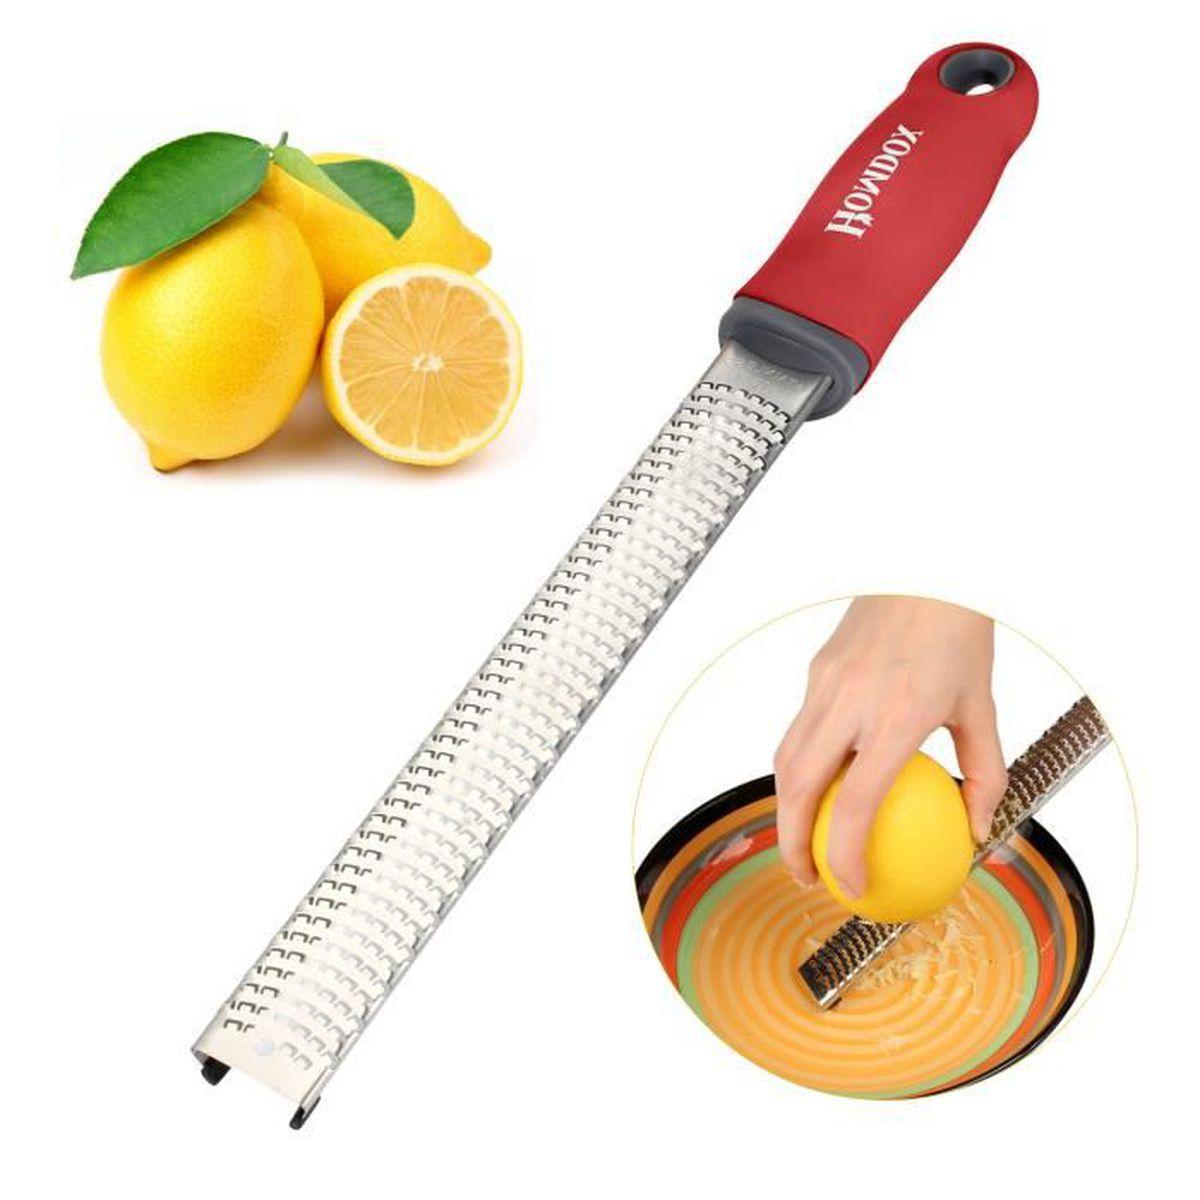 R pe citron ustensile de cuisine multifonction inox r pe for Ustensile de cuisine pour gaucher